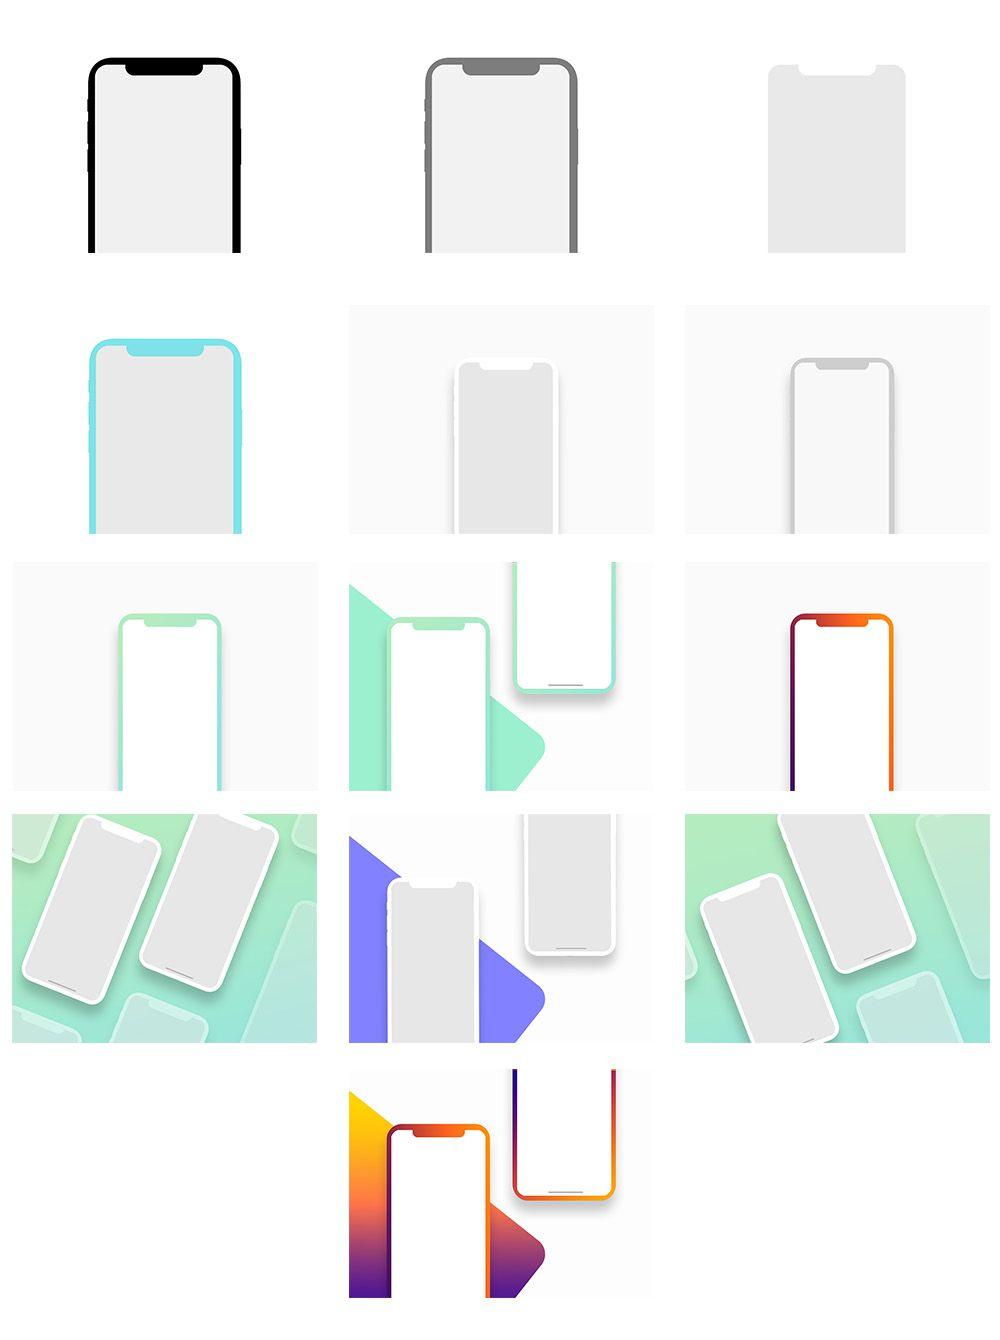 iPhone x Mockups苹果X多色样机模型素材psd源文件